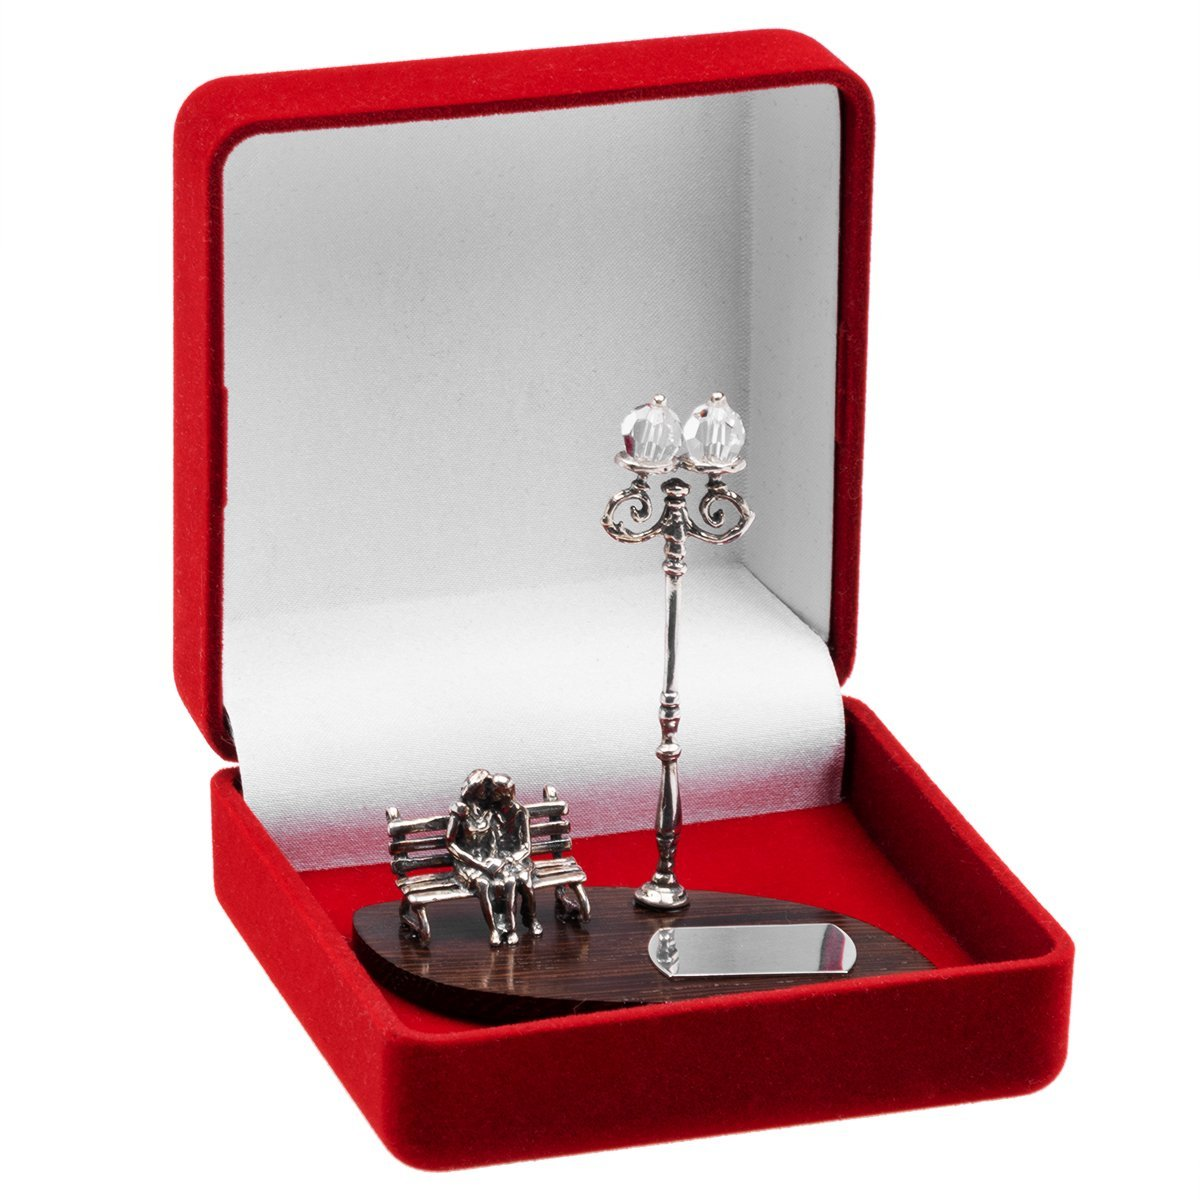 Figurka zakochani na ławce ślub srebro 925 grawer